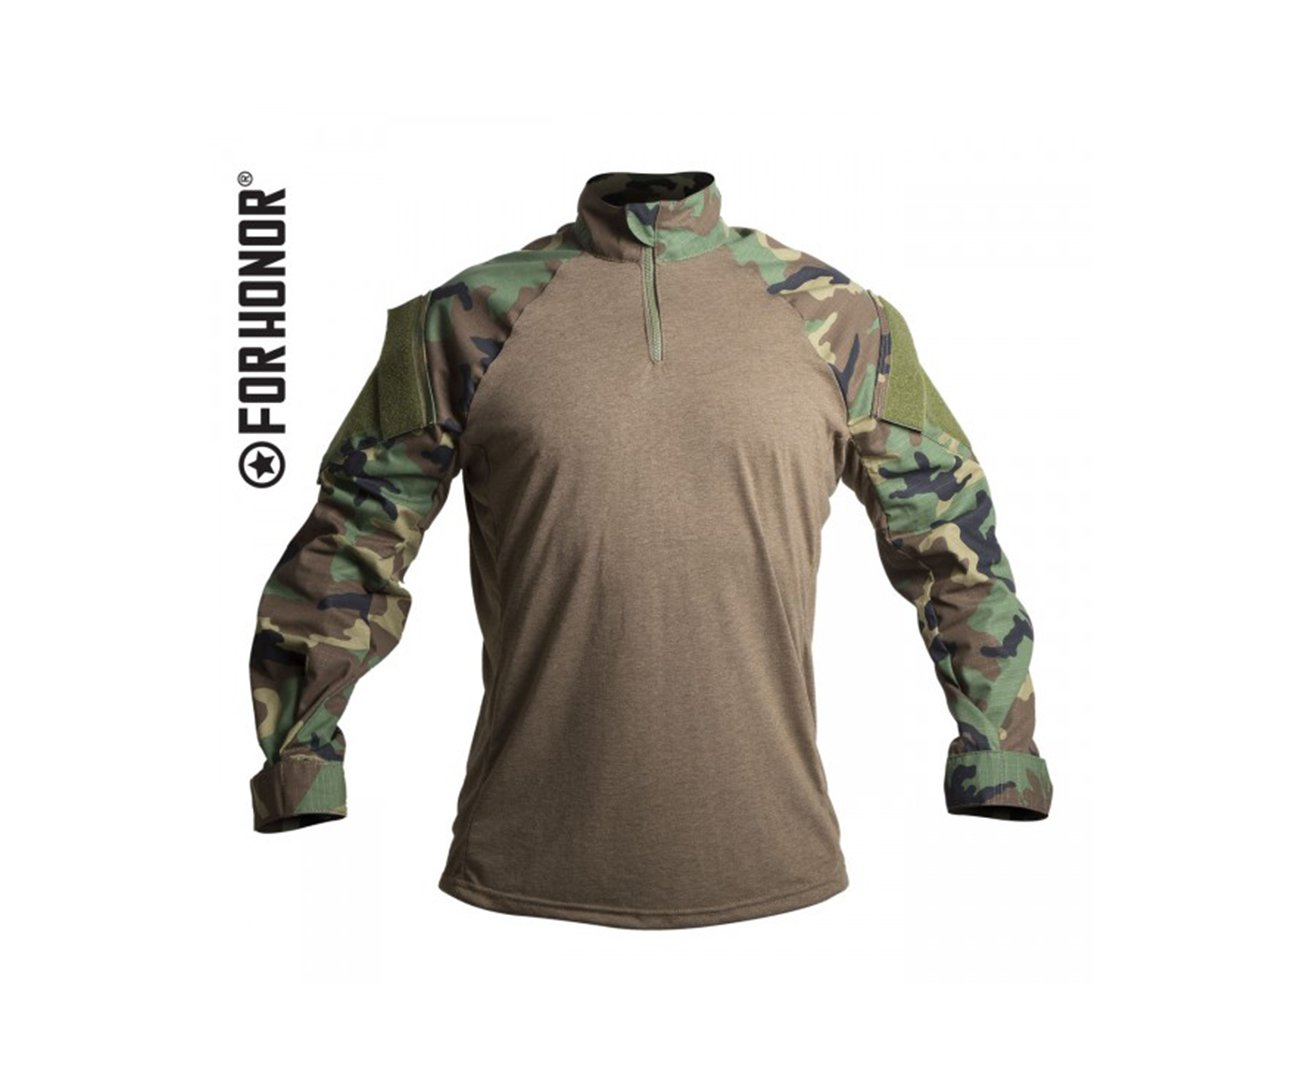 Camisa De Combate Forhonor 711 Woodland (combat Shirt)